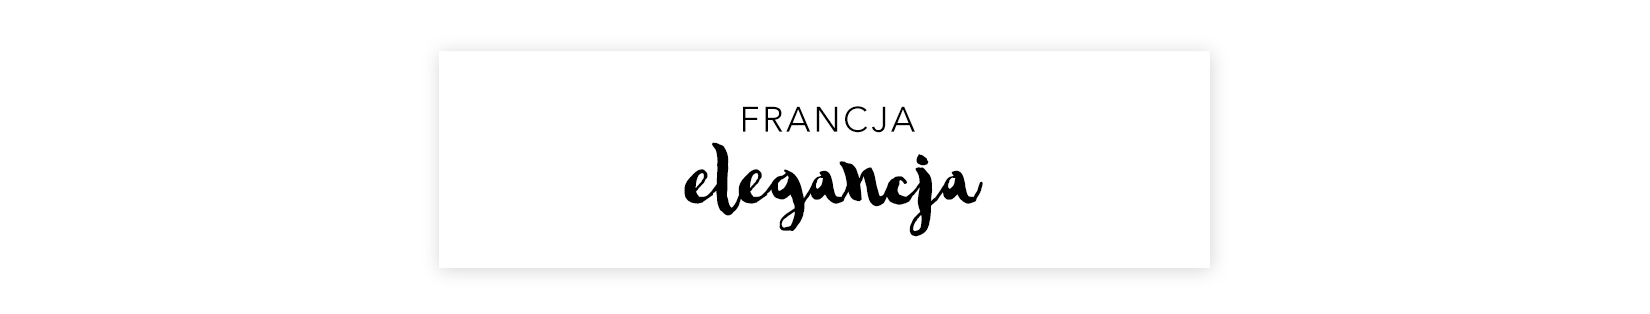 naglowek-francja-elegancja